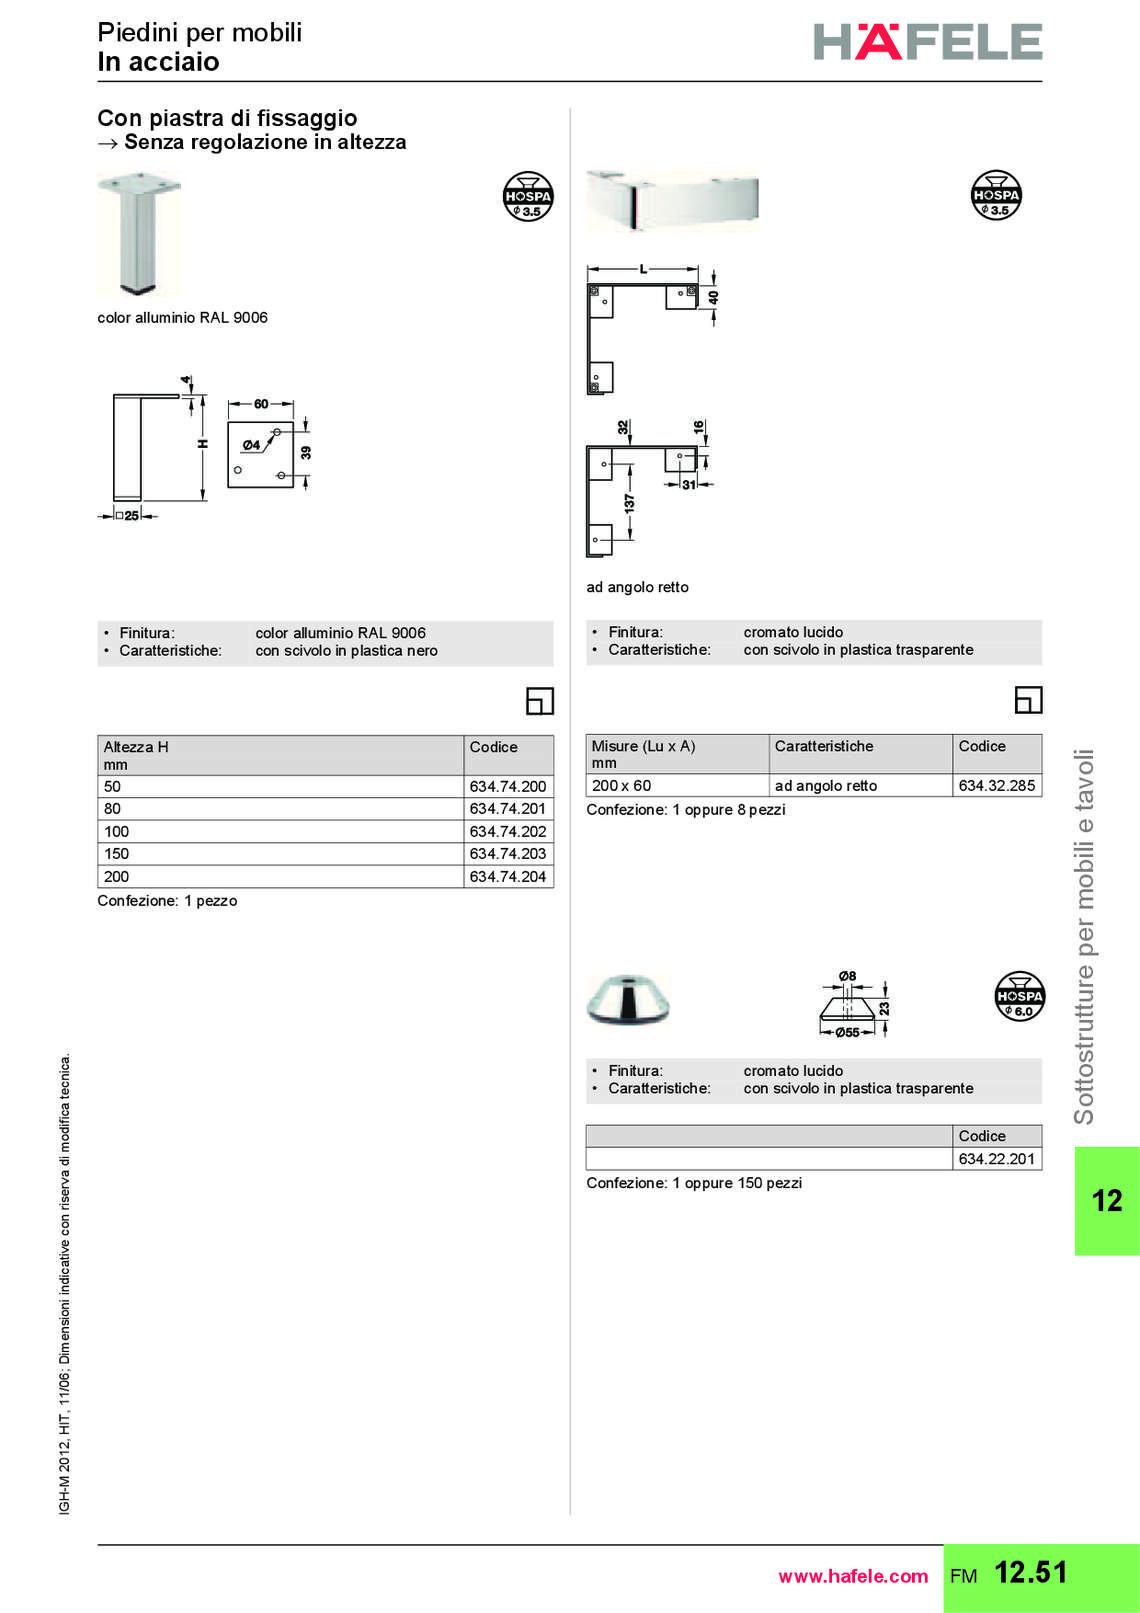 hafele-sottostrutture-per-mobili_83_074.jpg